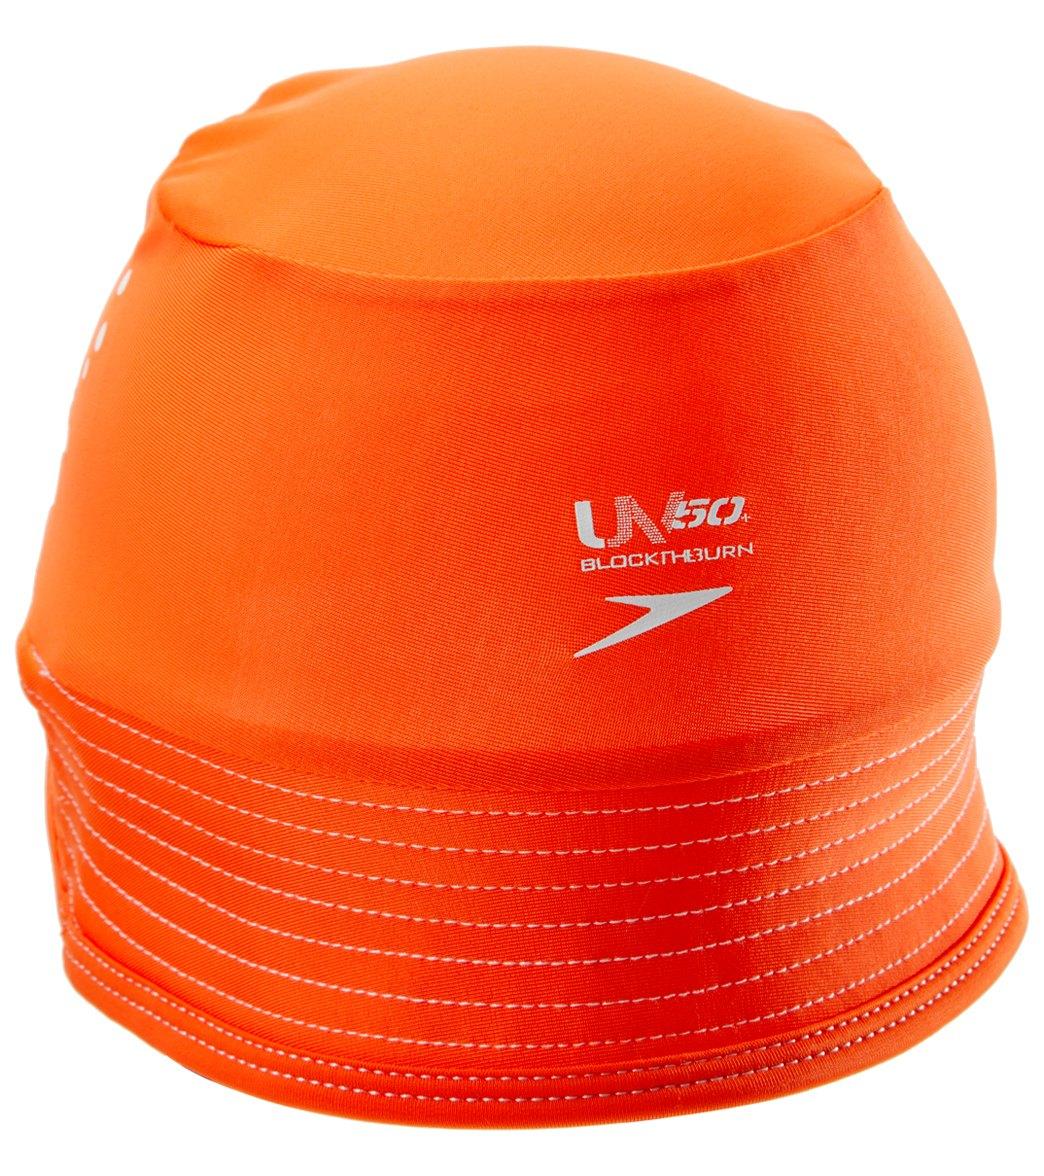 Speedo Boys  UV Bucket Hat (Infant-3yrs) at SwimOutlet.com 72fb96366bee